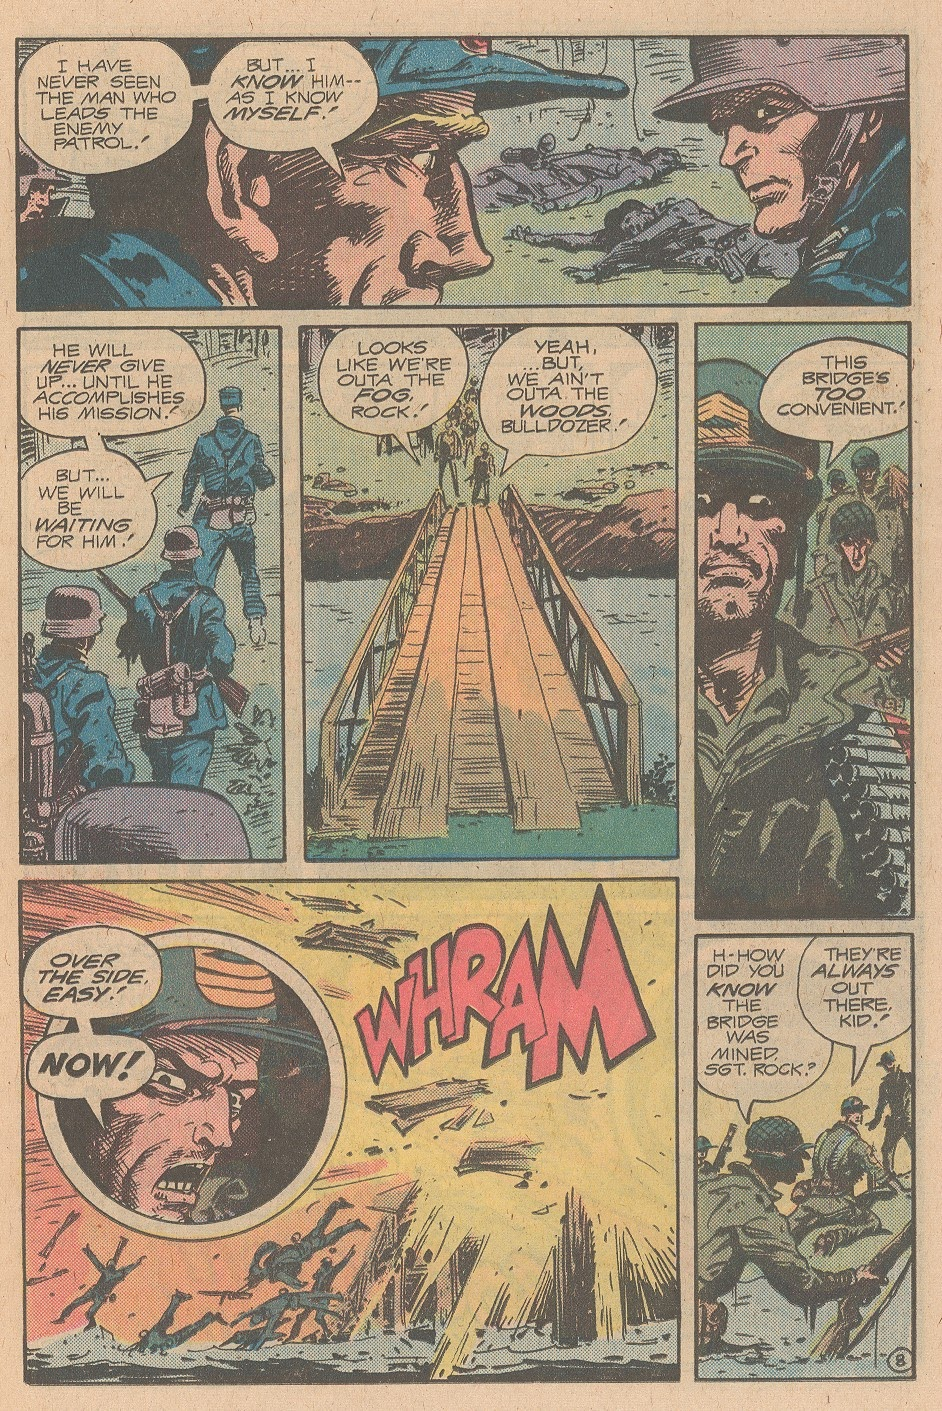 Read online Sgt. Rock comic -  Issue #346 - 9